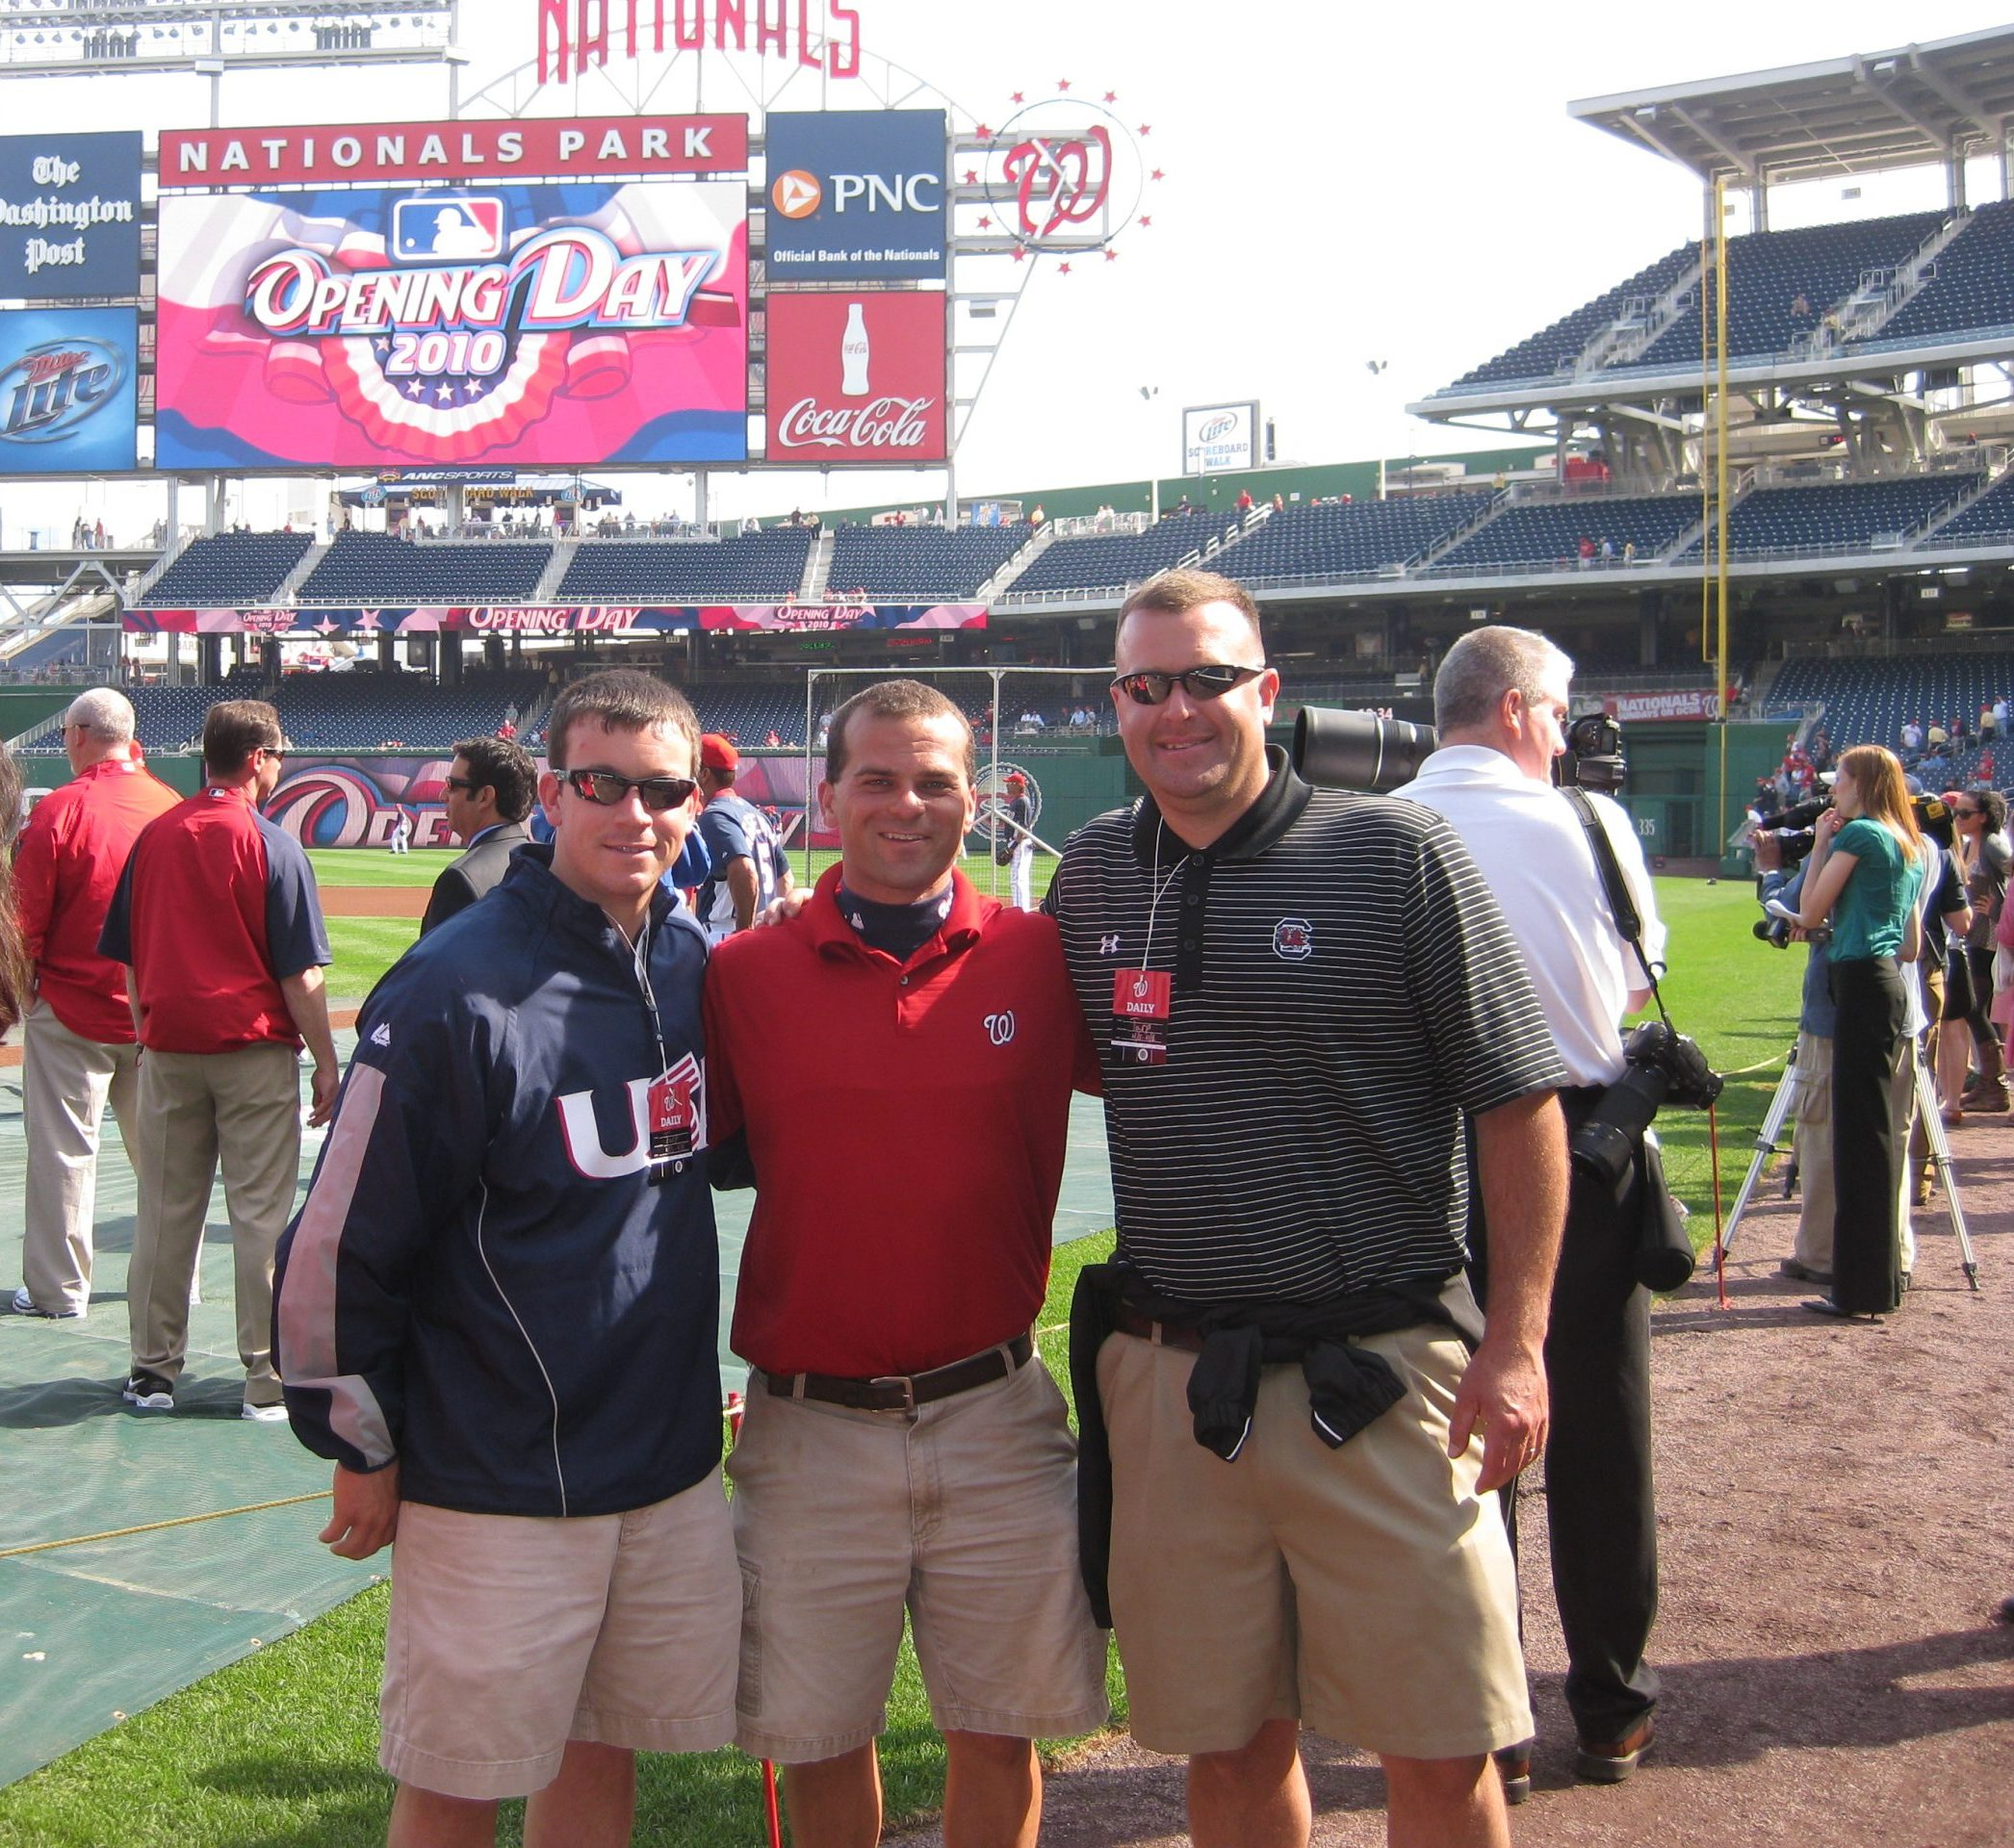 Three men pose on a baseball field